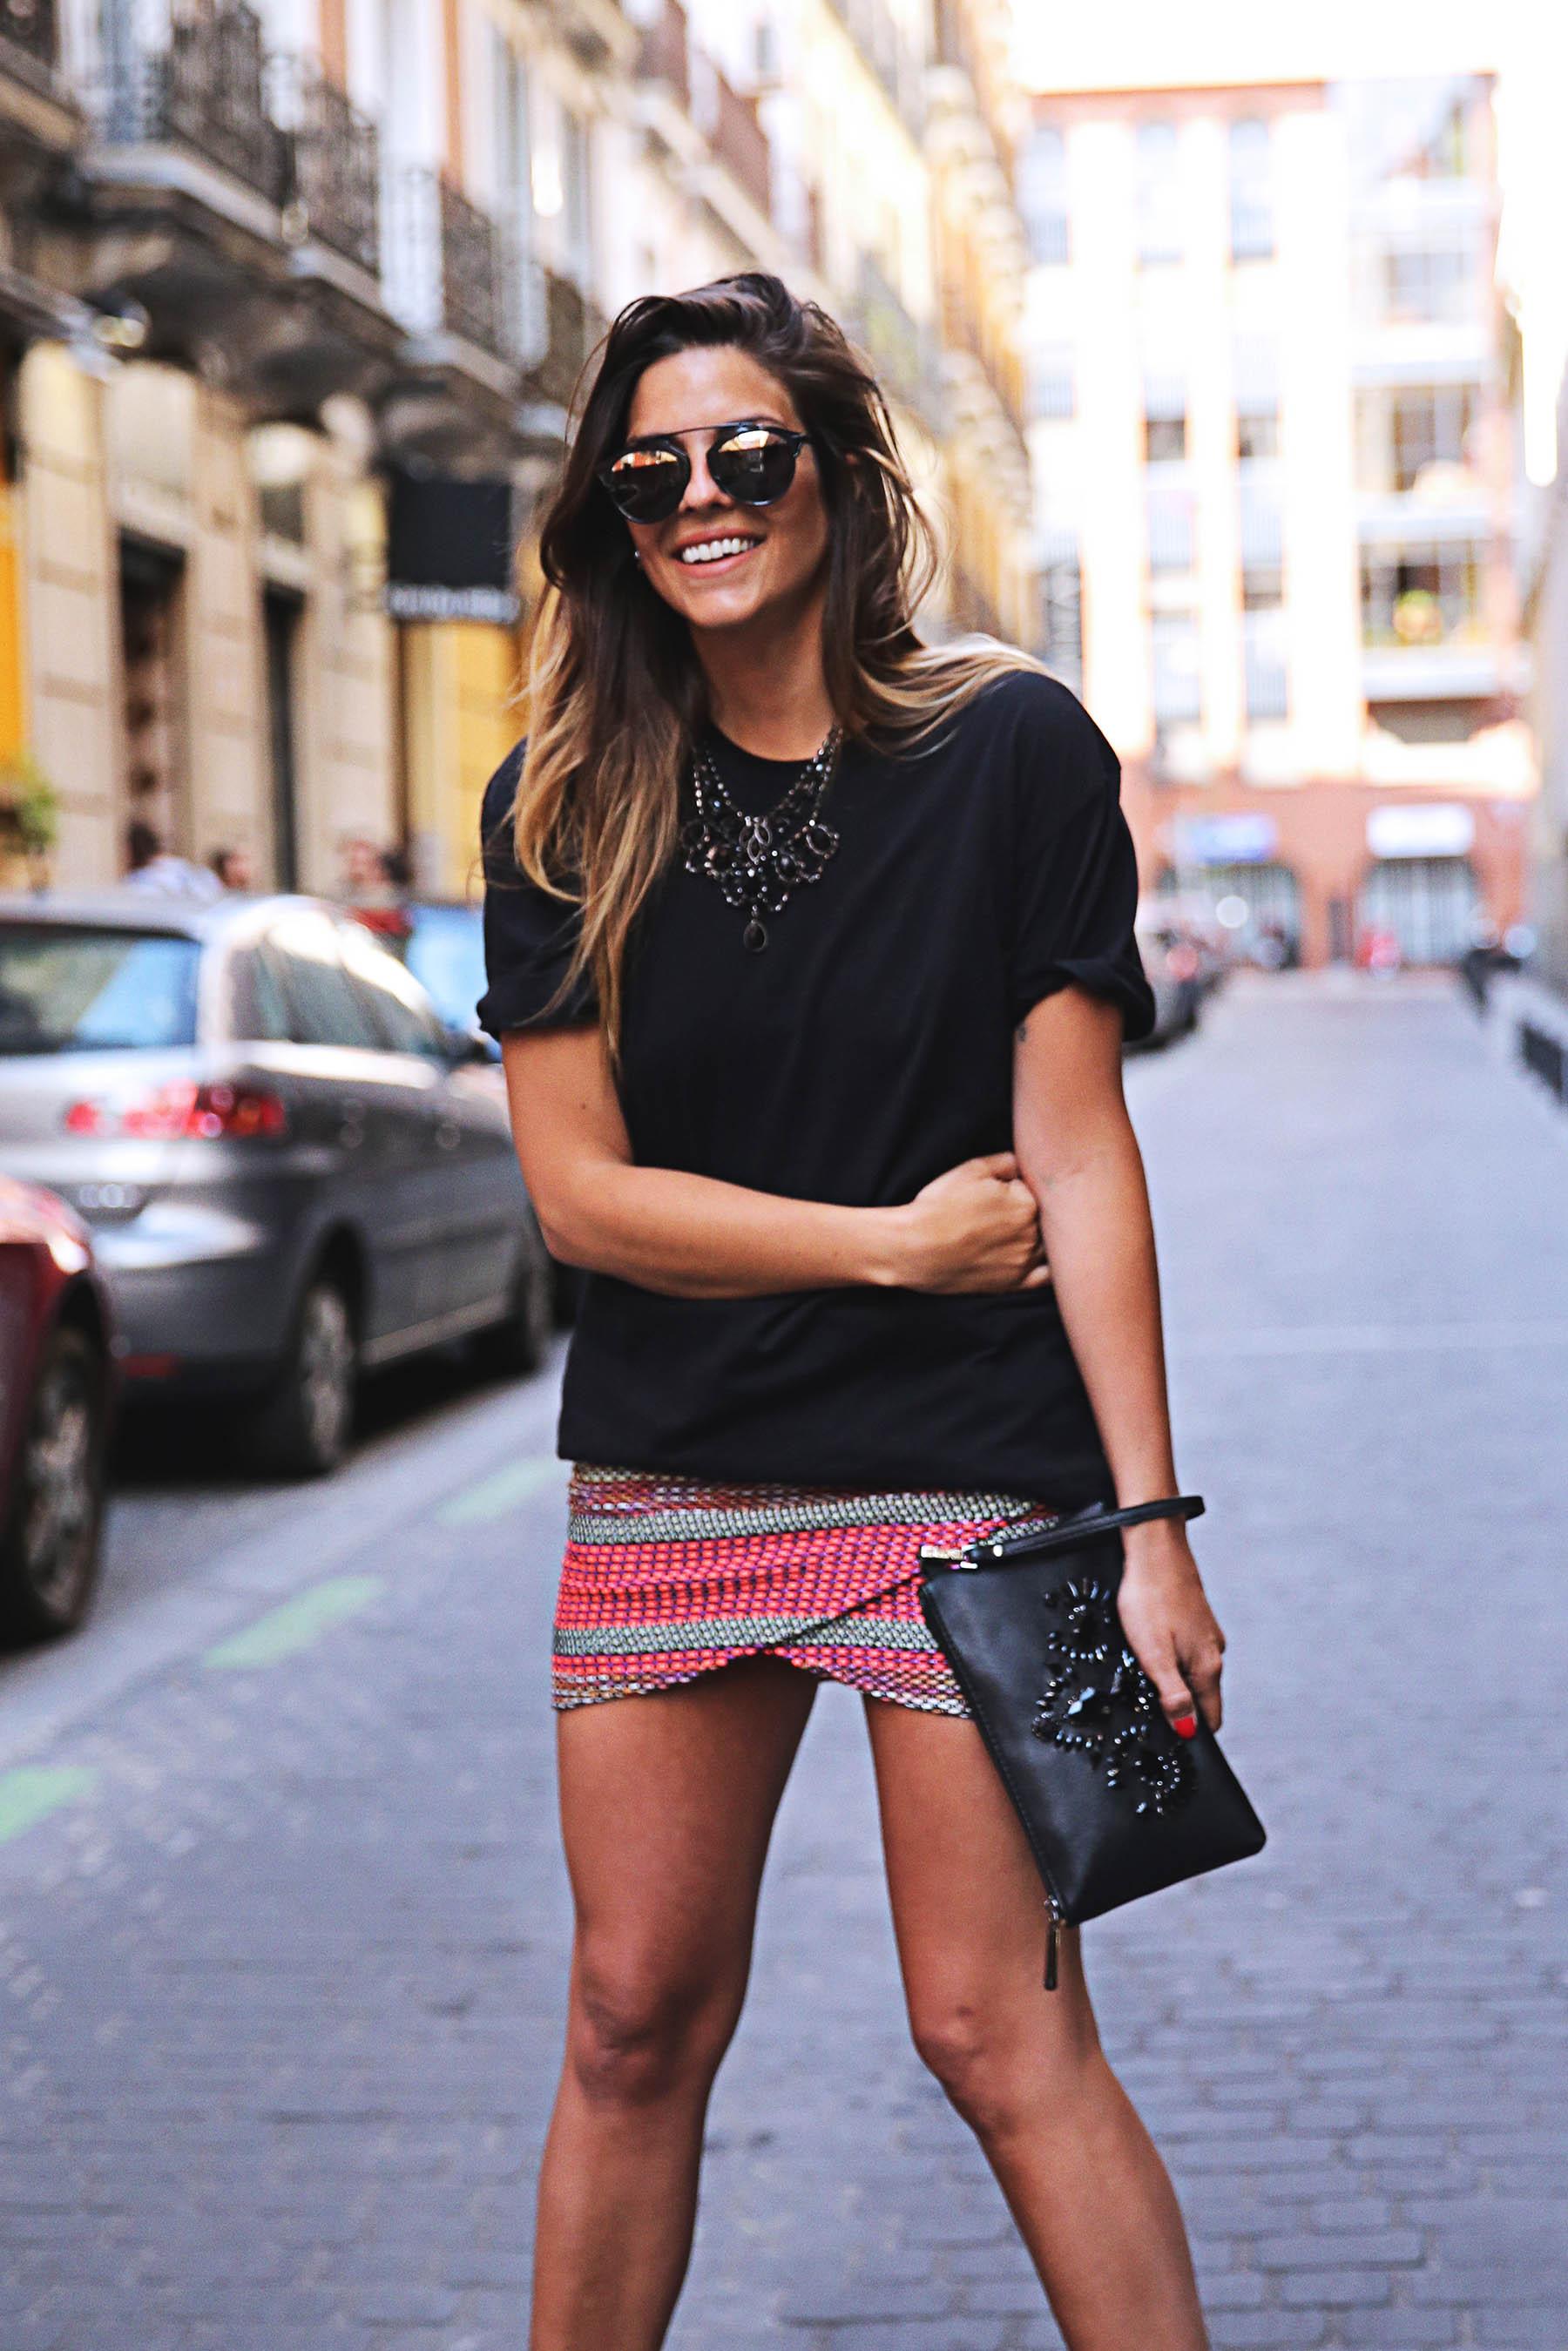 trendy-taste-look-outfit-street-style-ootd-blog-blogger-fashion-spain-moda-españa-falda-etnica-ethnic-print-skirt-steve-madden-basic-tee-dior-black-negro-7